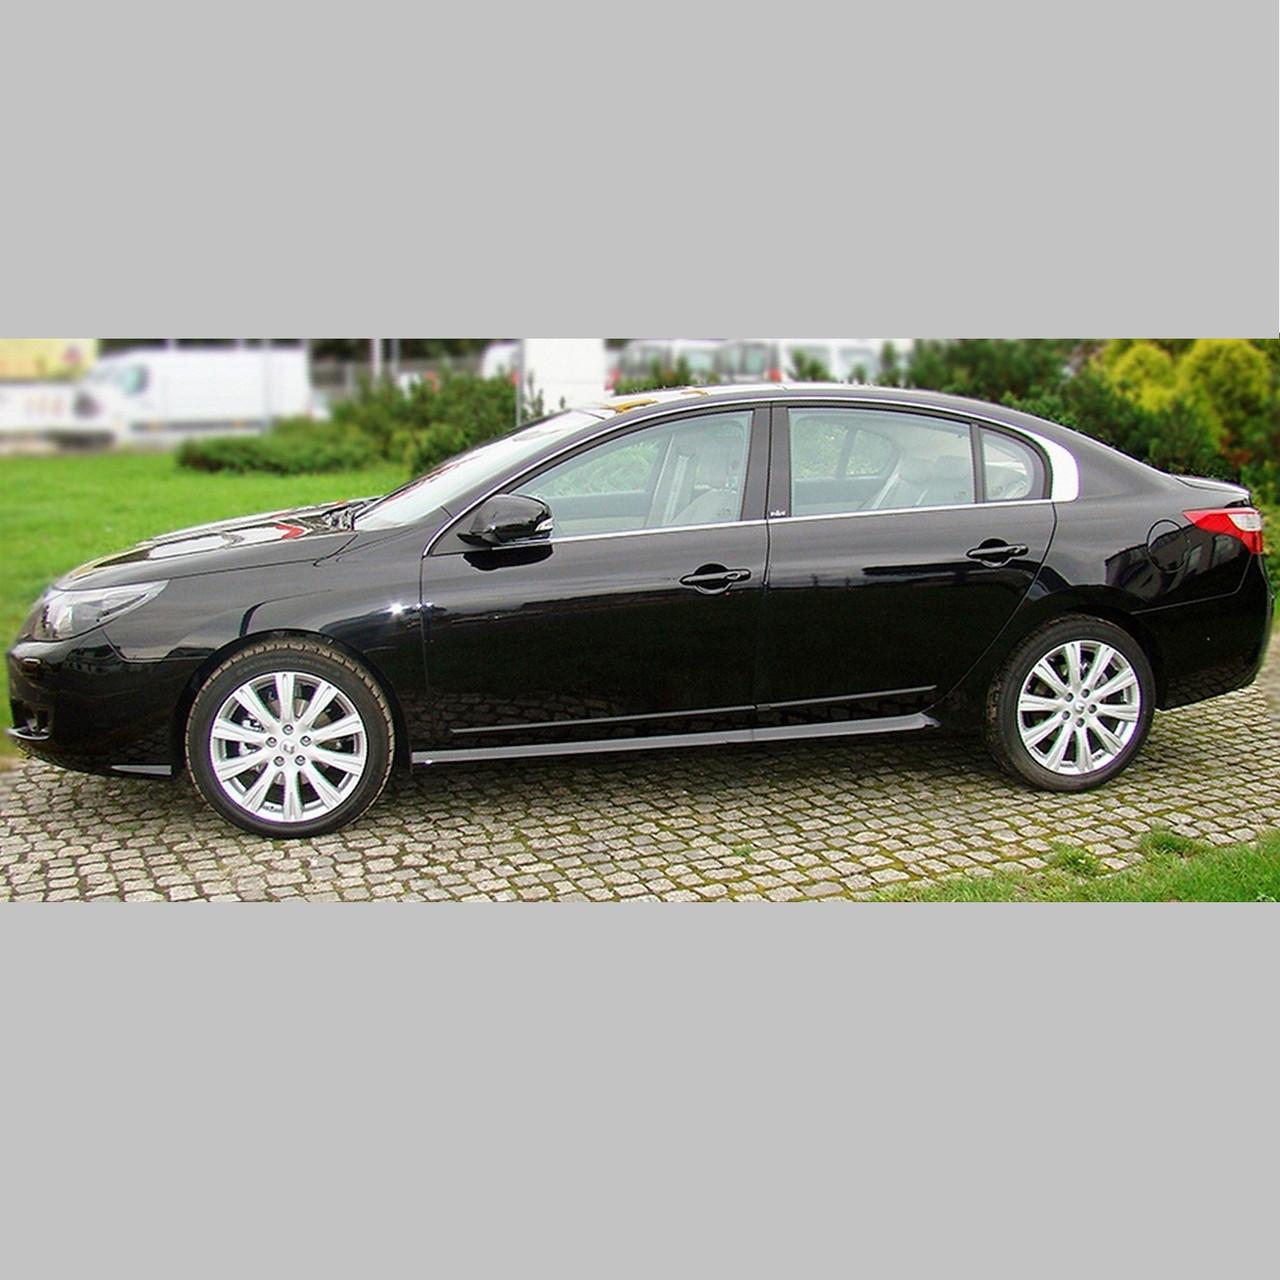 Молдинги на двері для Renault Latitude 2010-2015